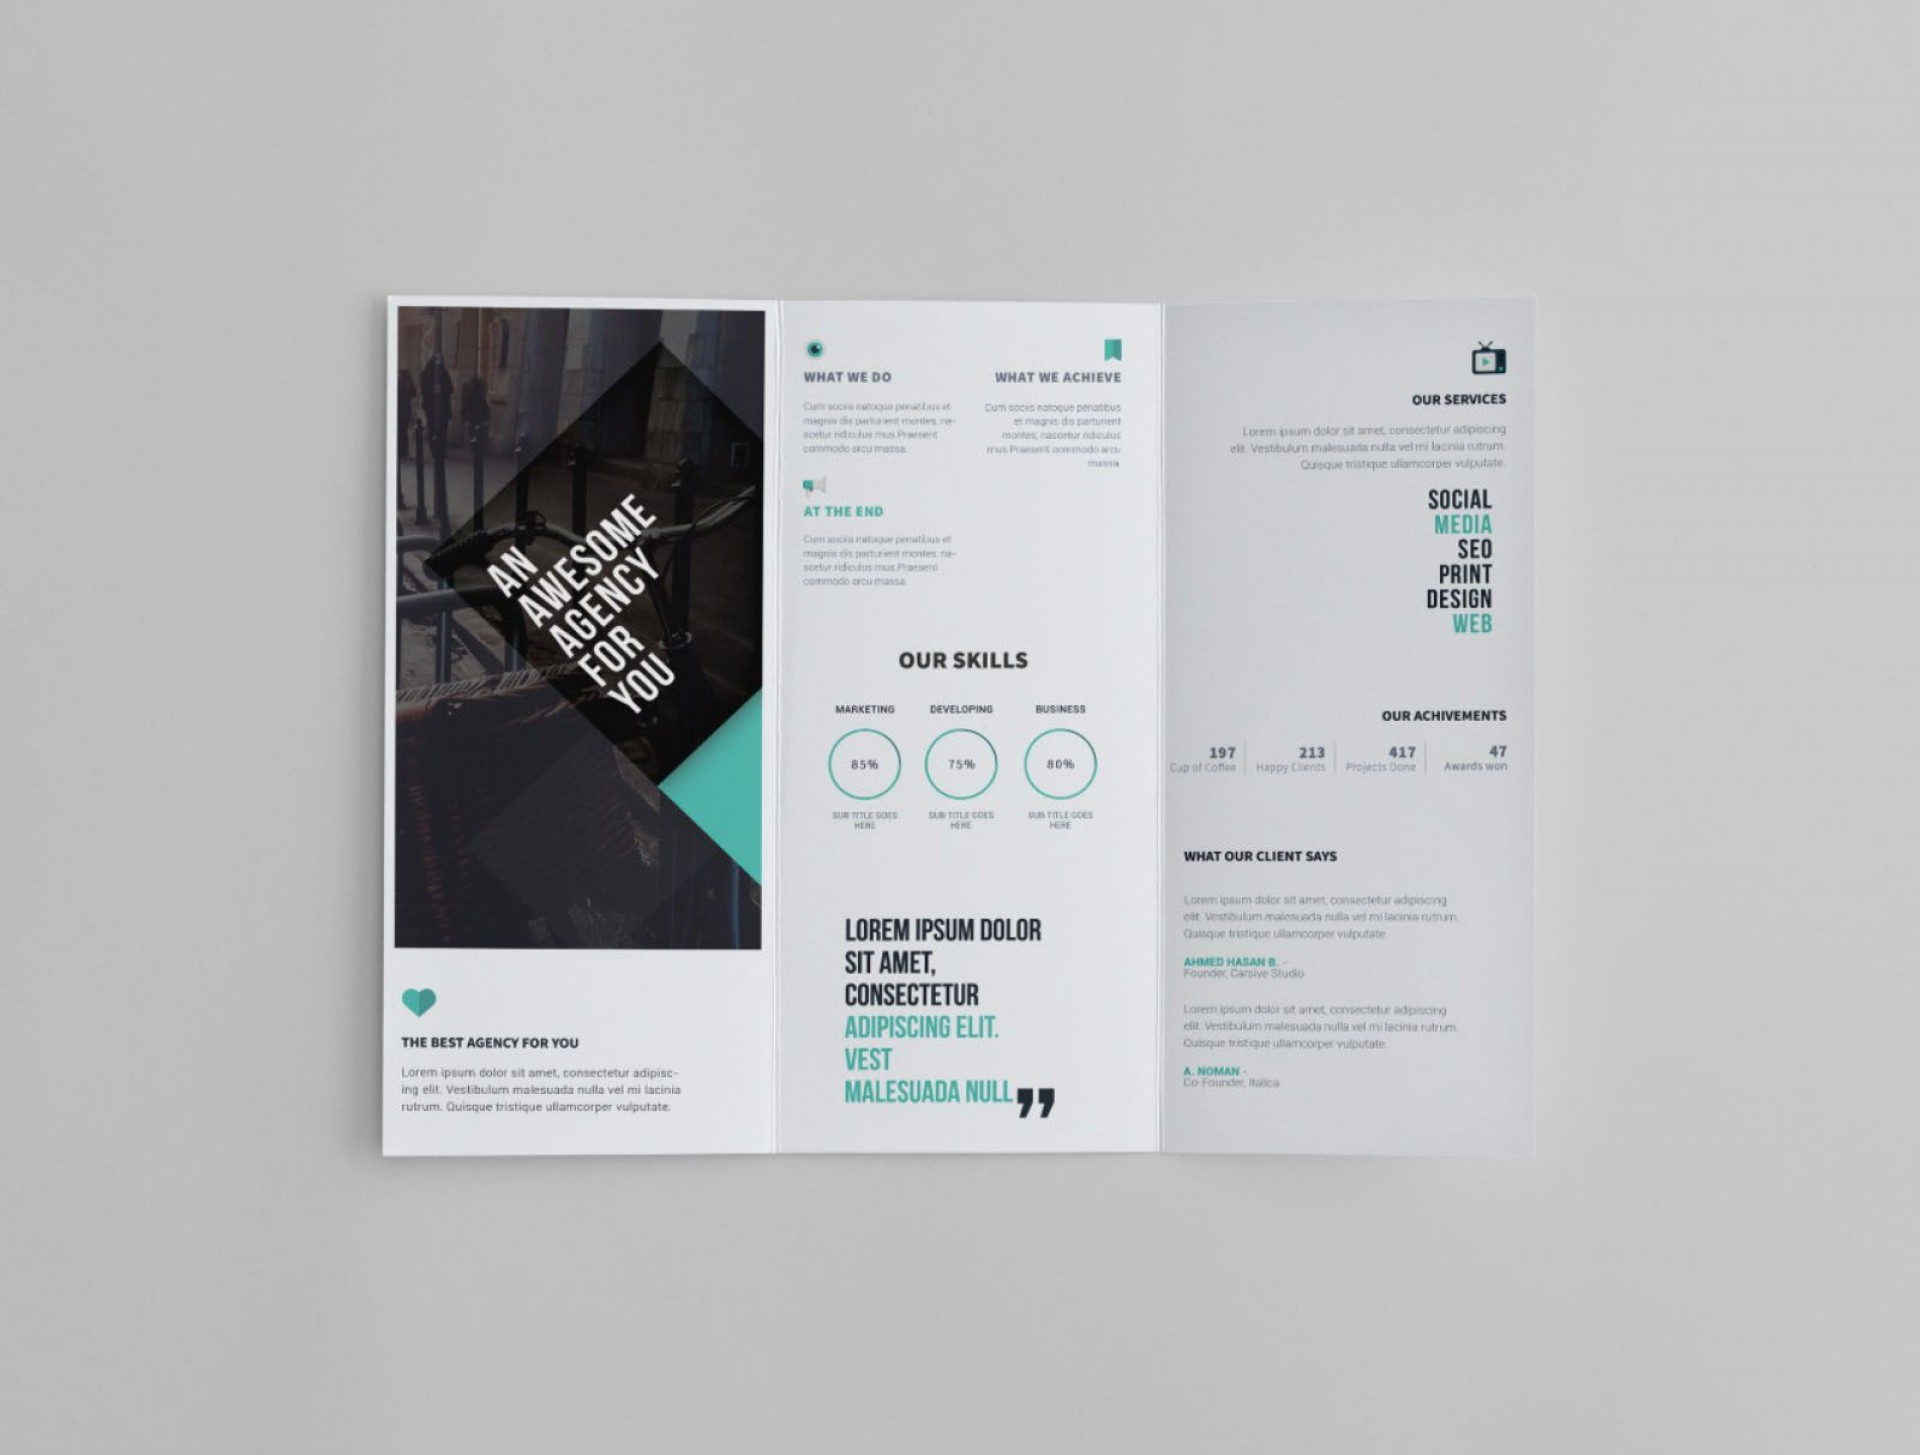 007 Awful Tri Fold Brochure Template Free Idea  Download Photoshop M Word Tri-fold Indesign Mac1920